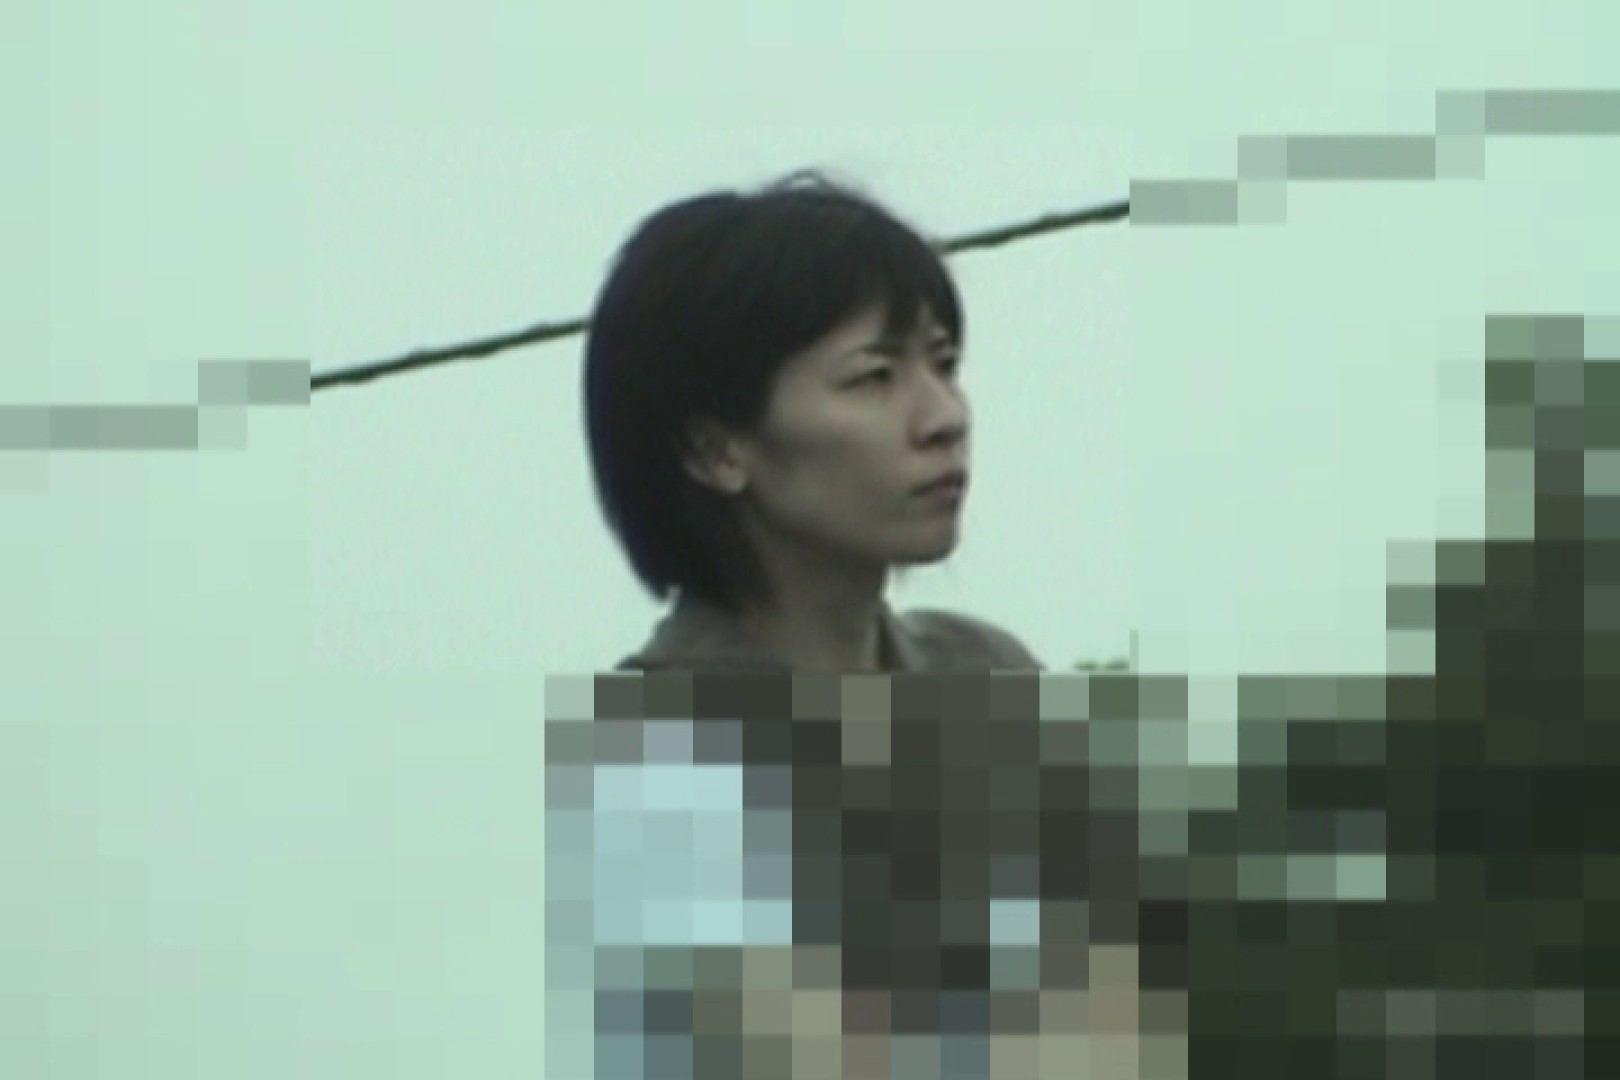 Aquaな露天風呂Vol.793 露天 | OLセックス  94画像 1